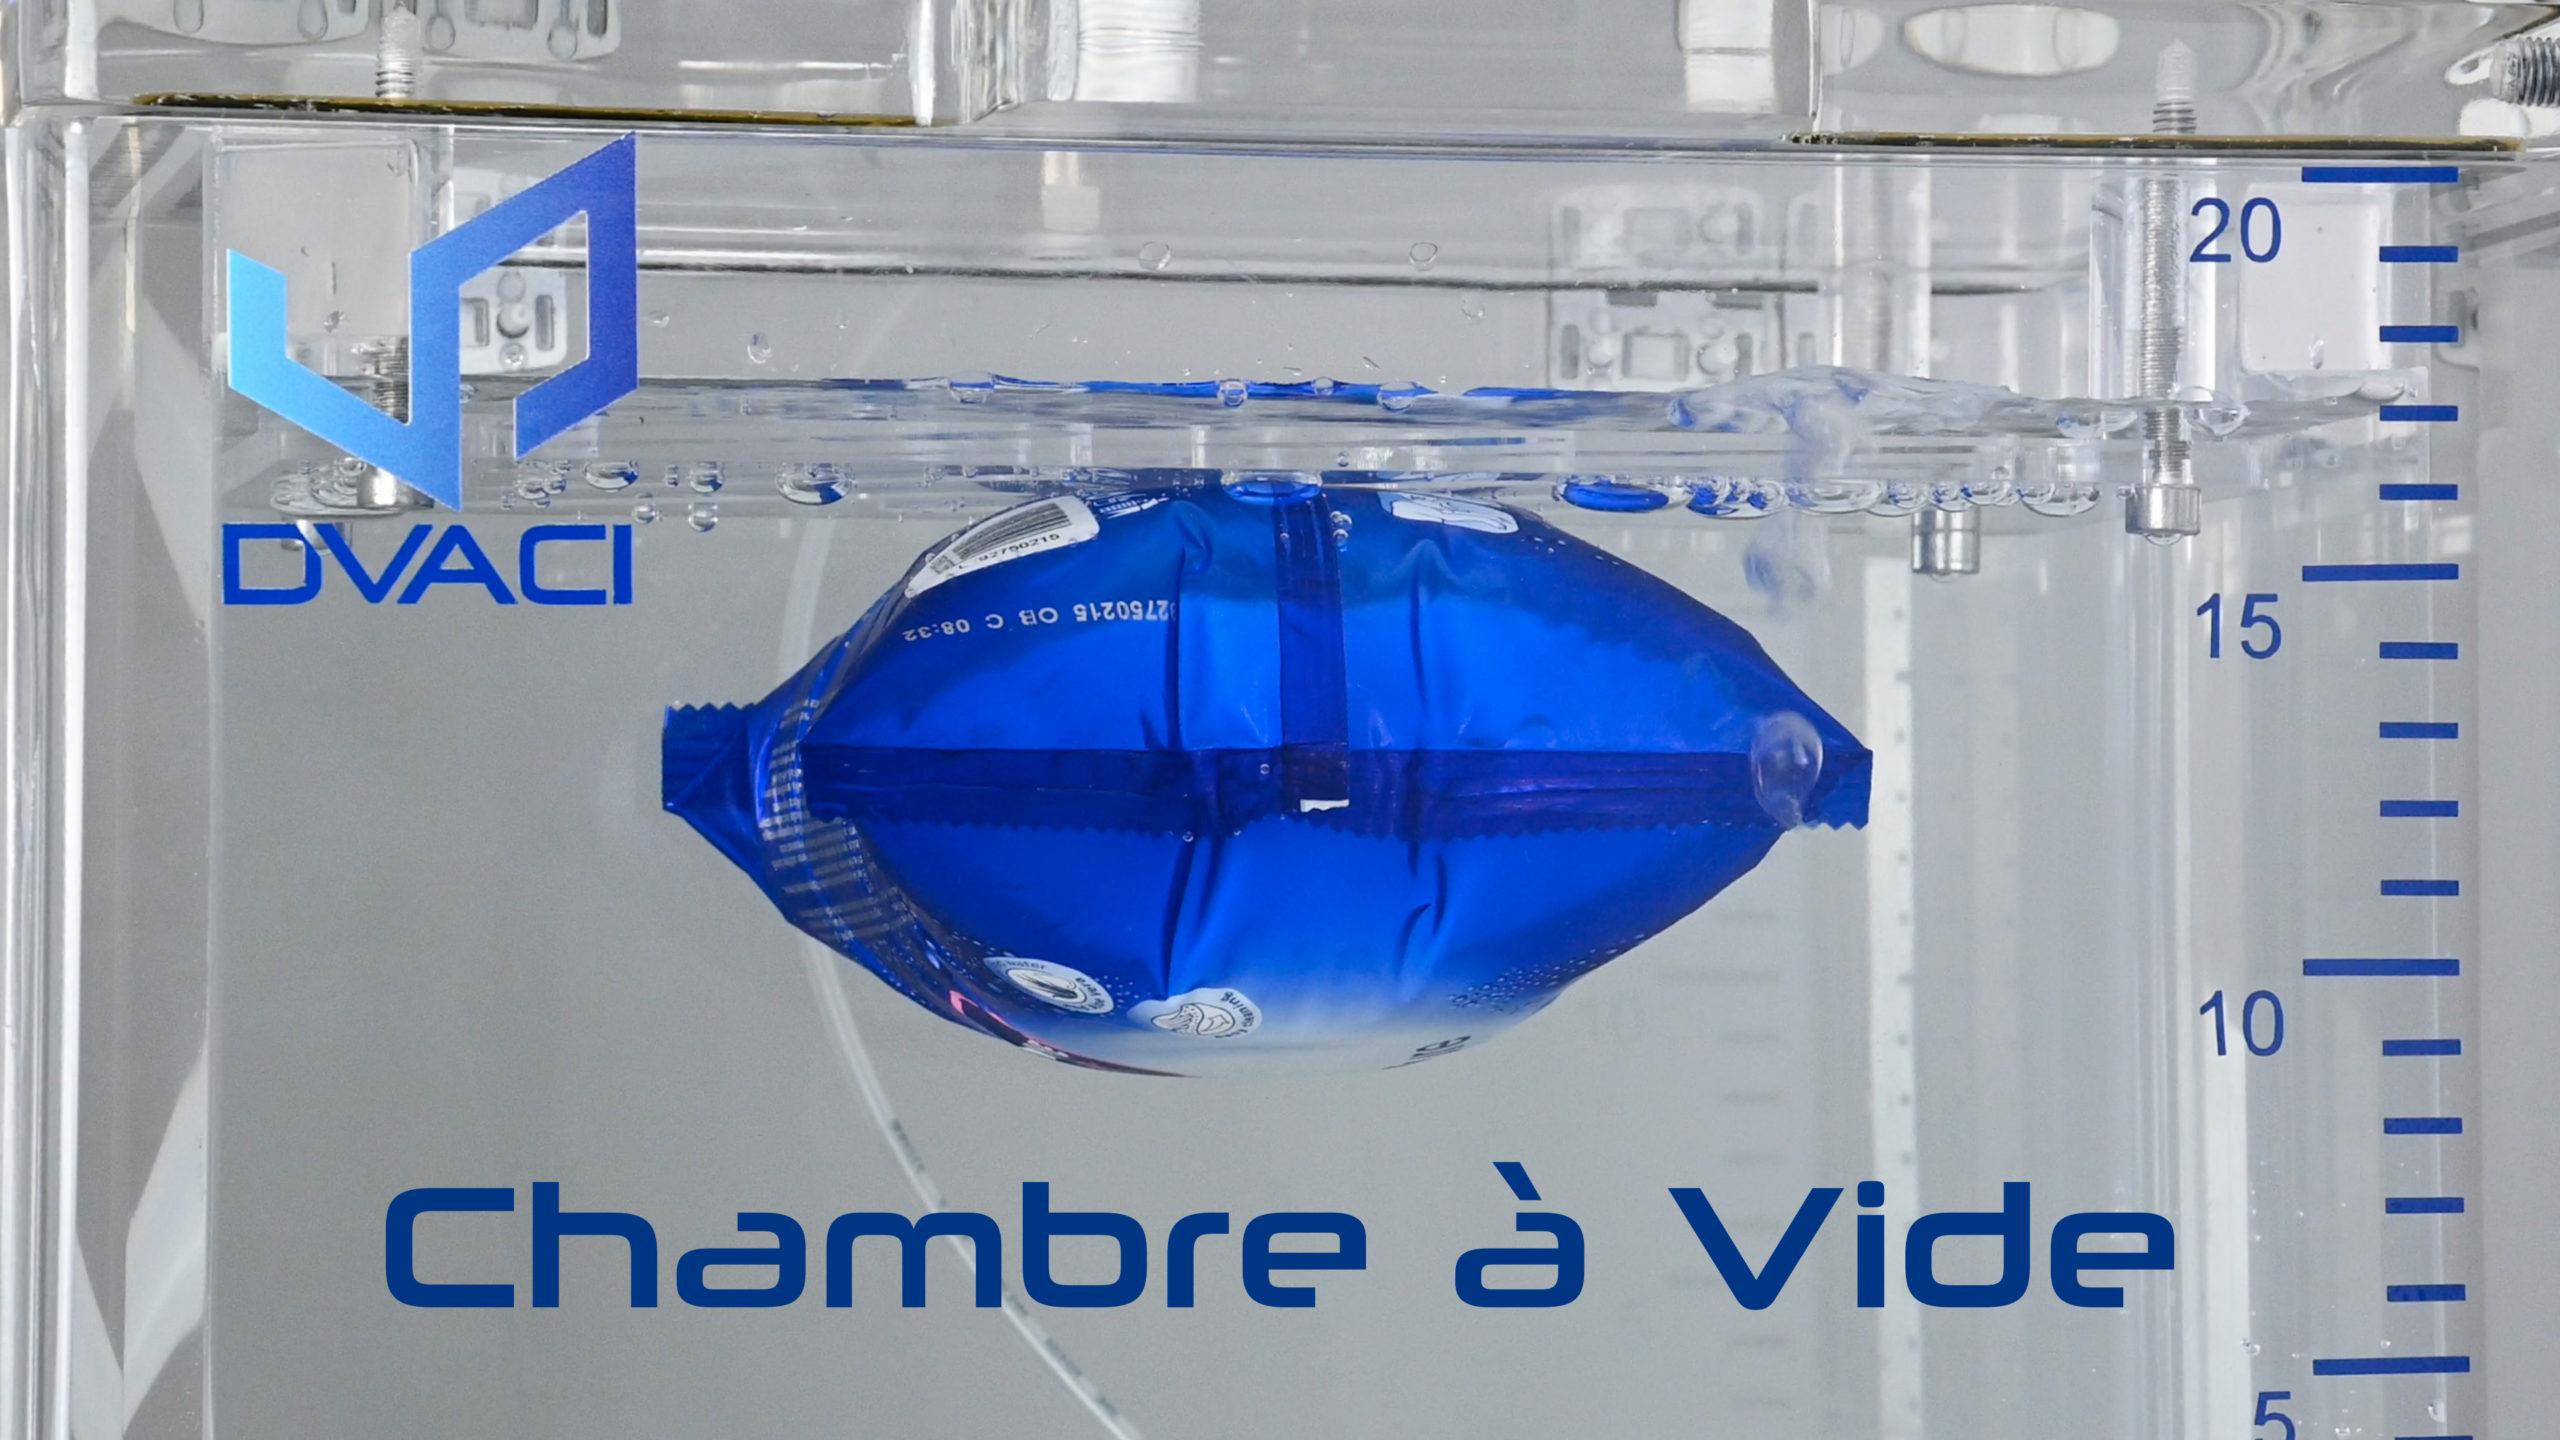 CDV Chambre Caisson a vide Controle Etancheite Emballage